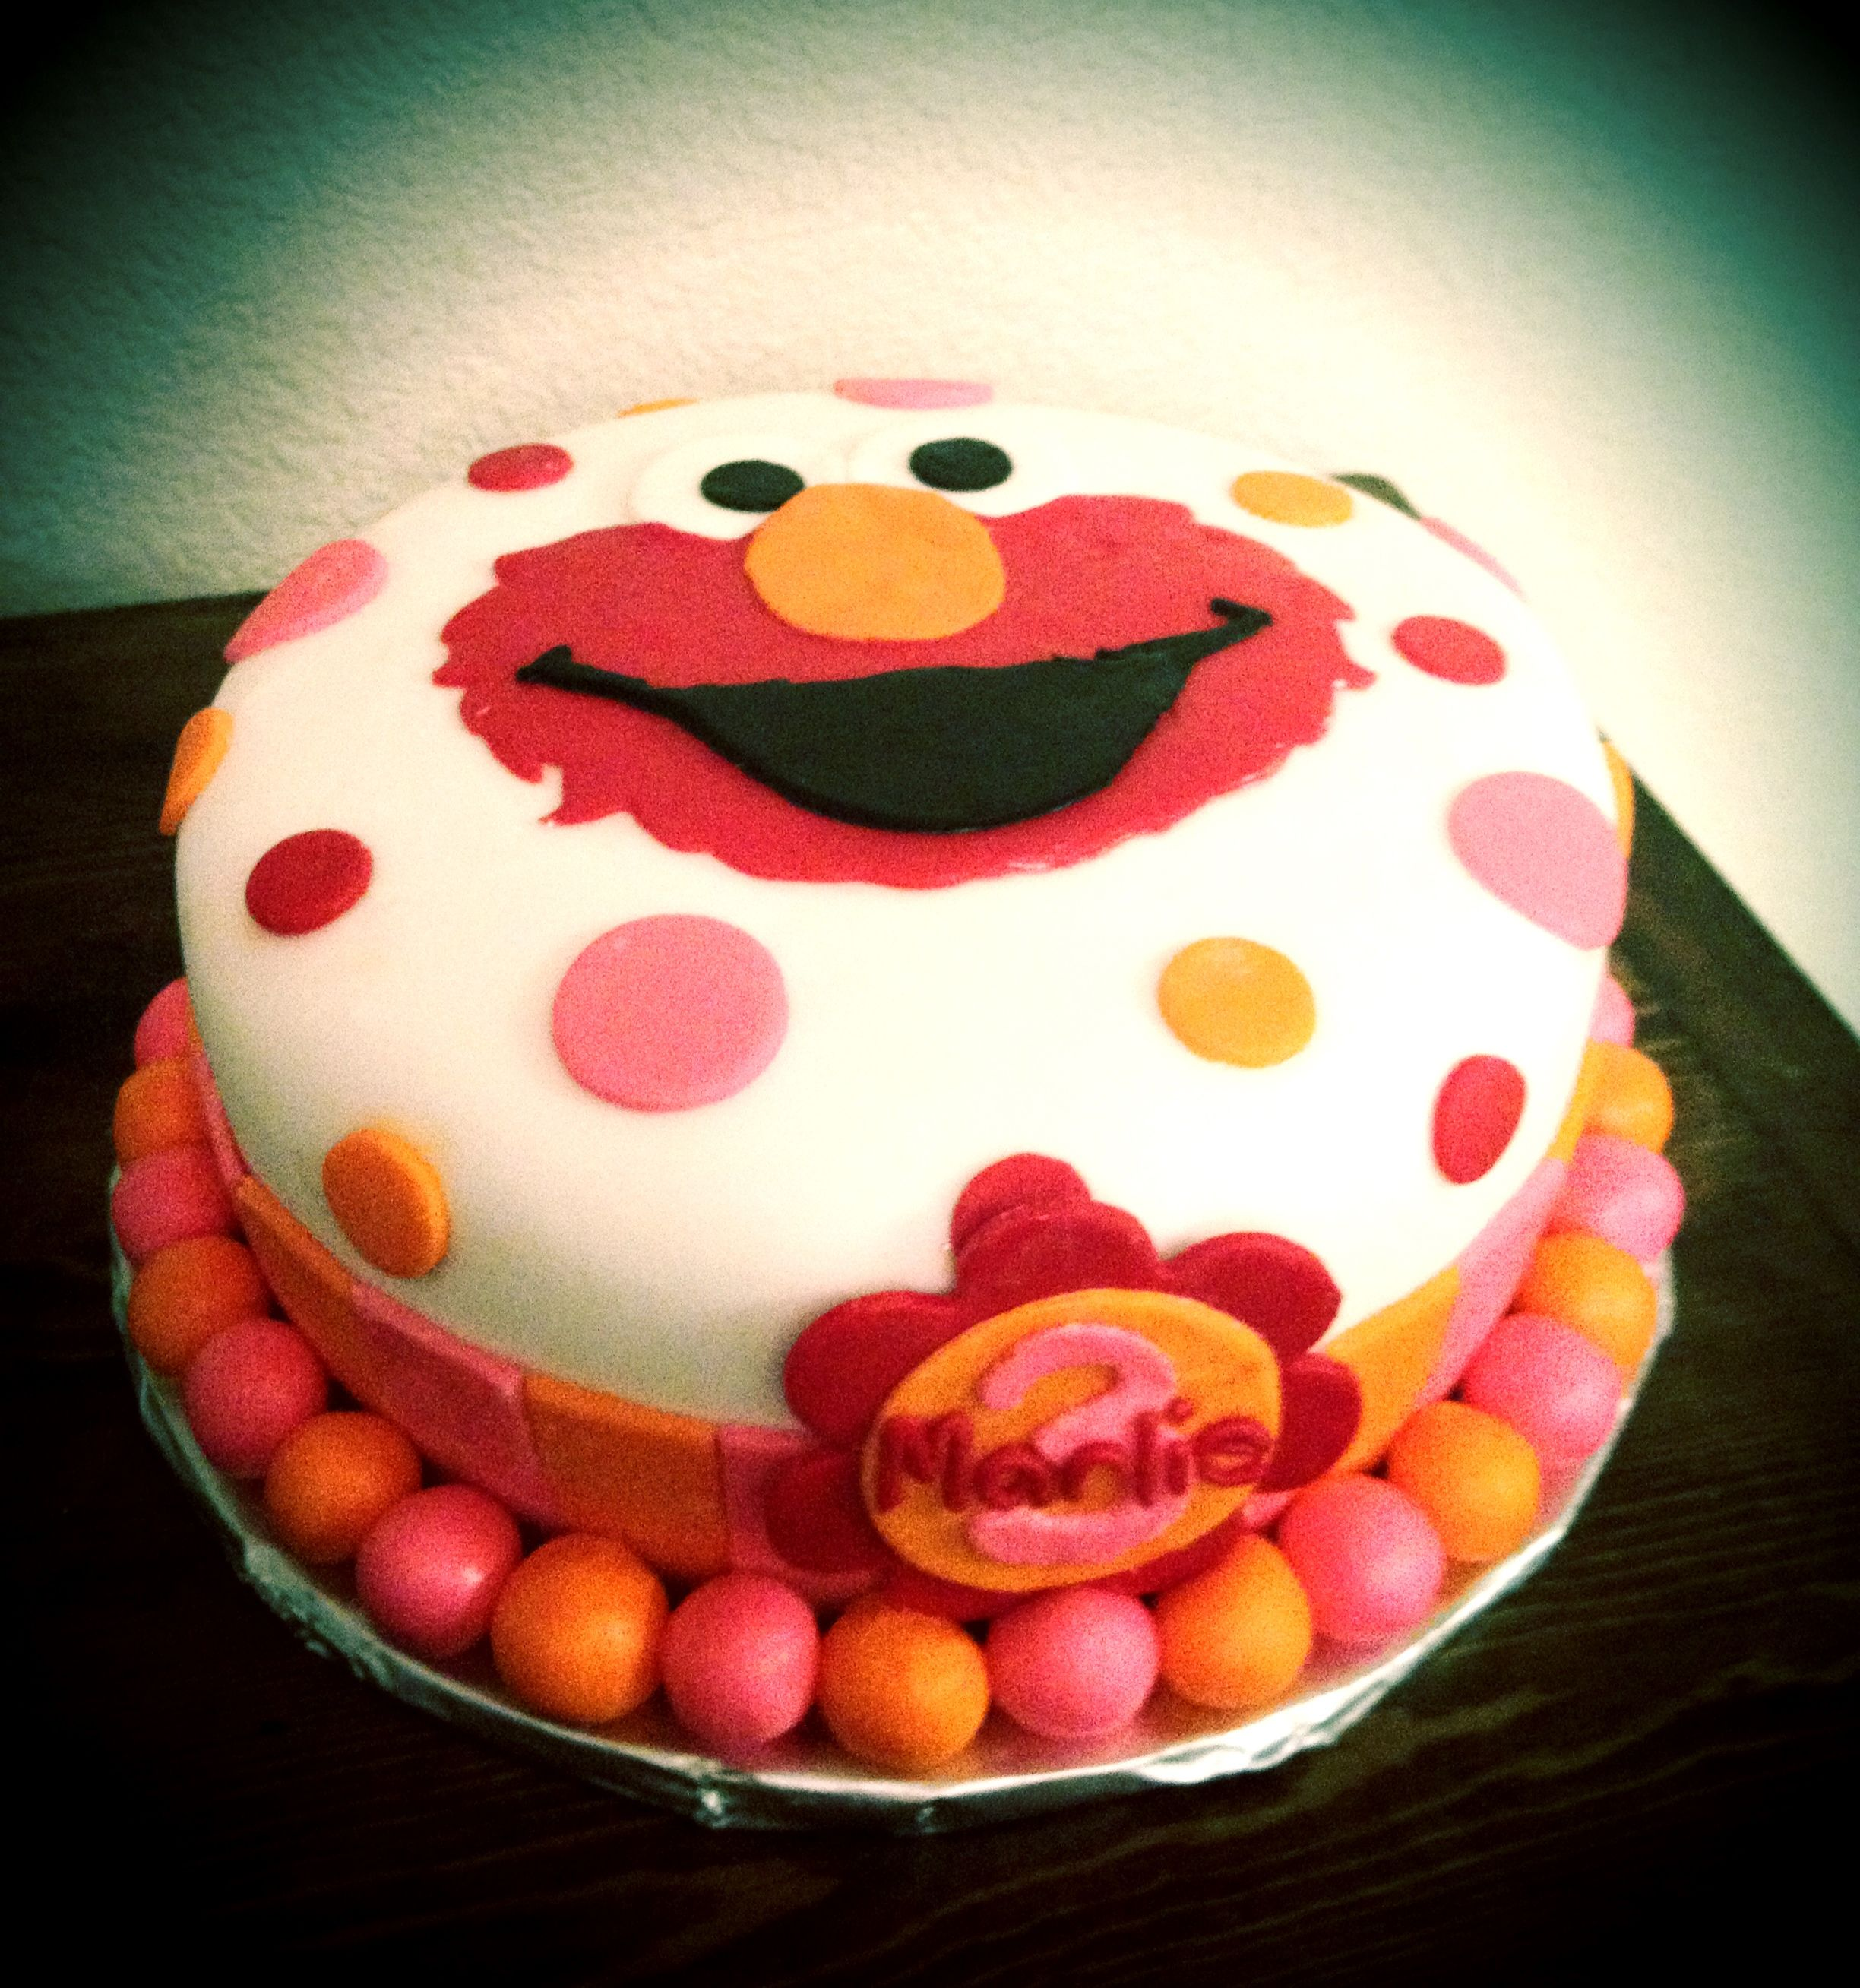 Phenomenal Elmo Birthday Cake Pink Orange And Red Elmo Birthday Cake Personalised Birthday Cards Veneteletsinfo